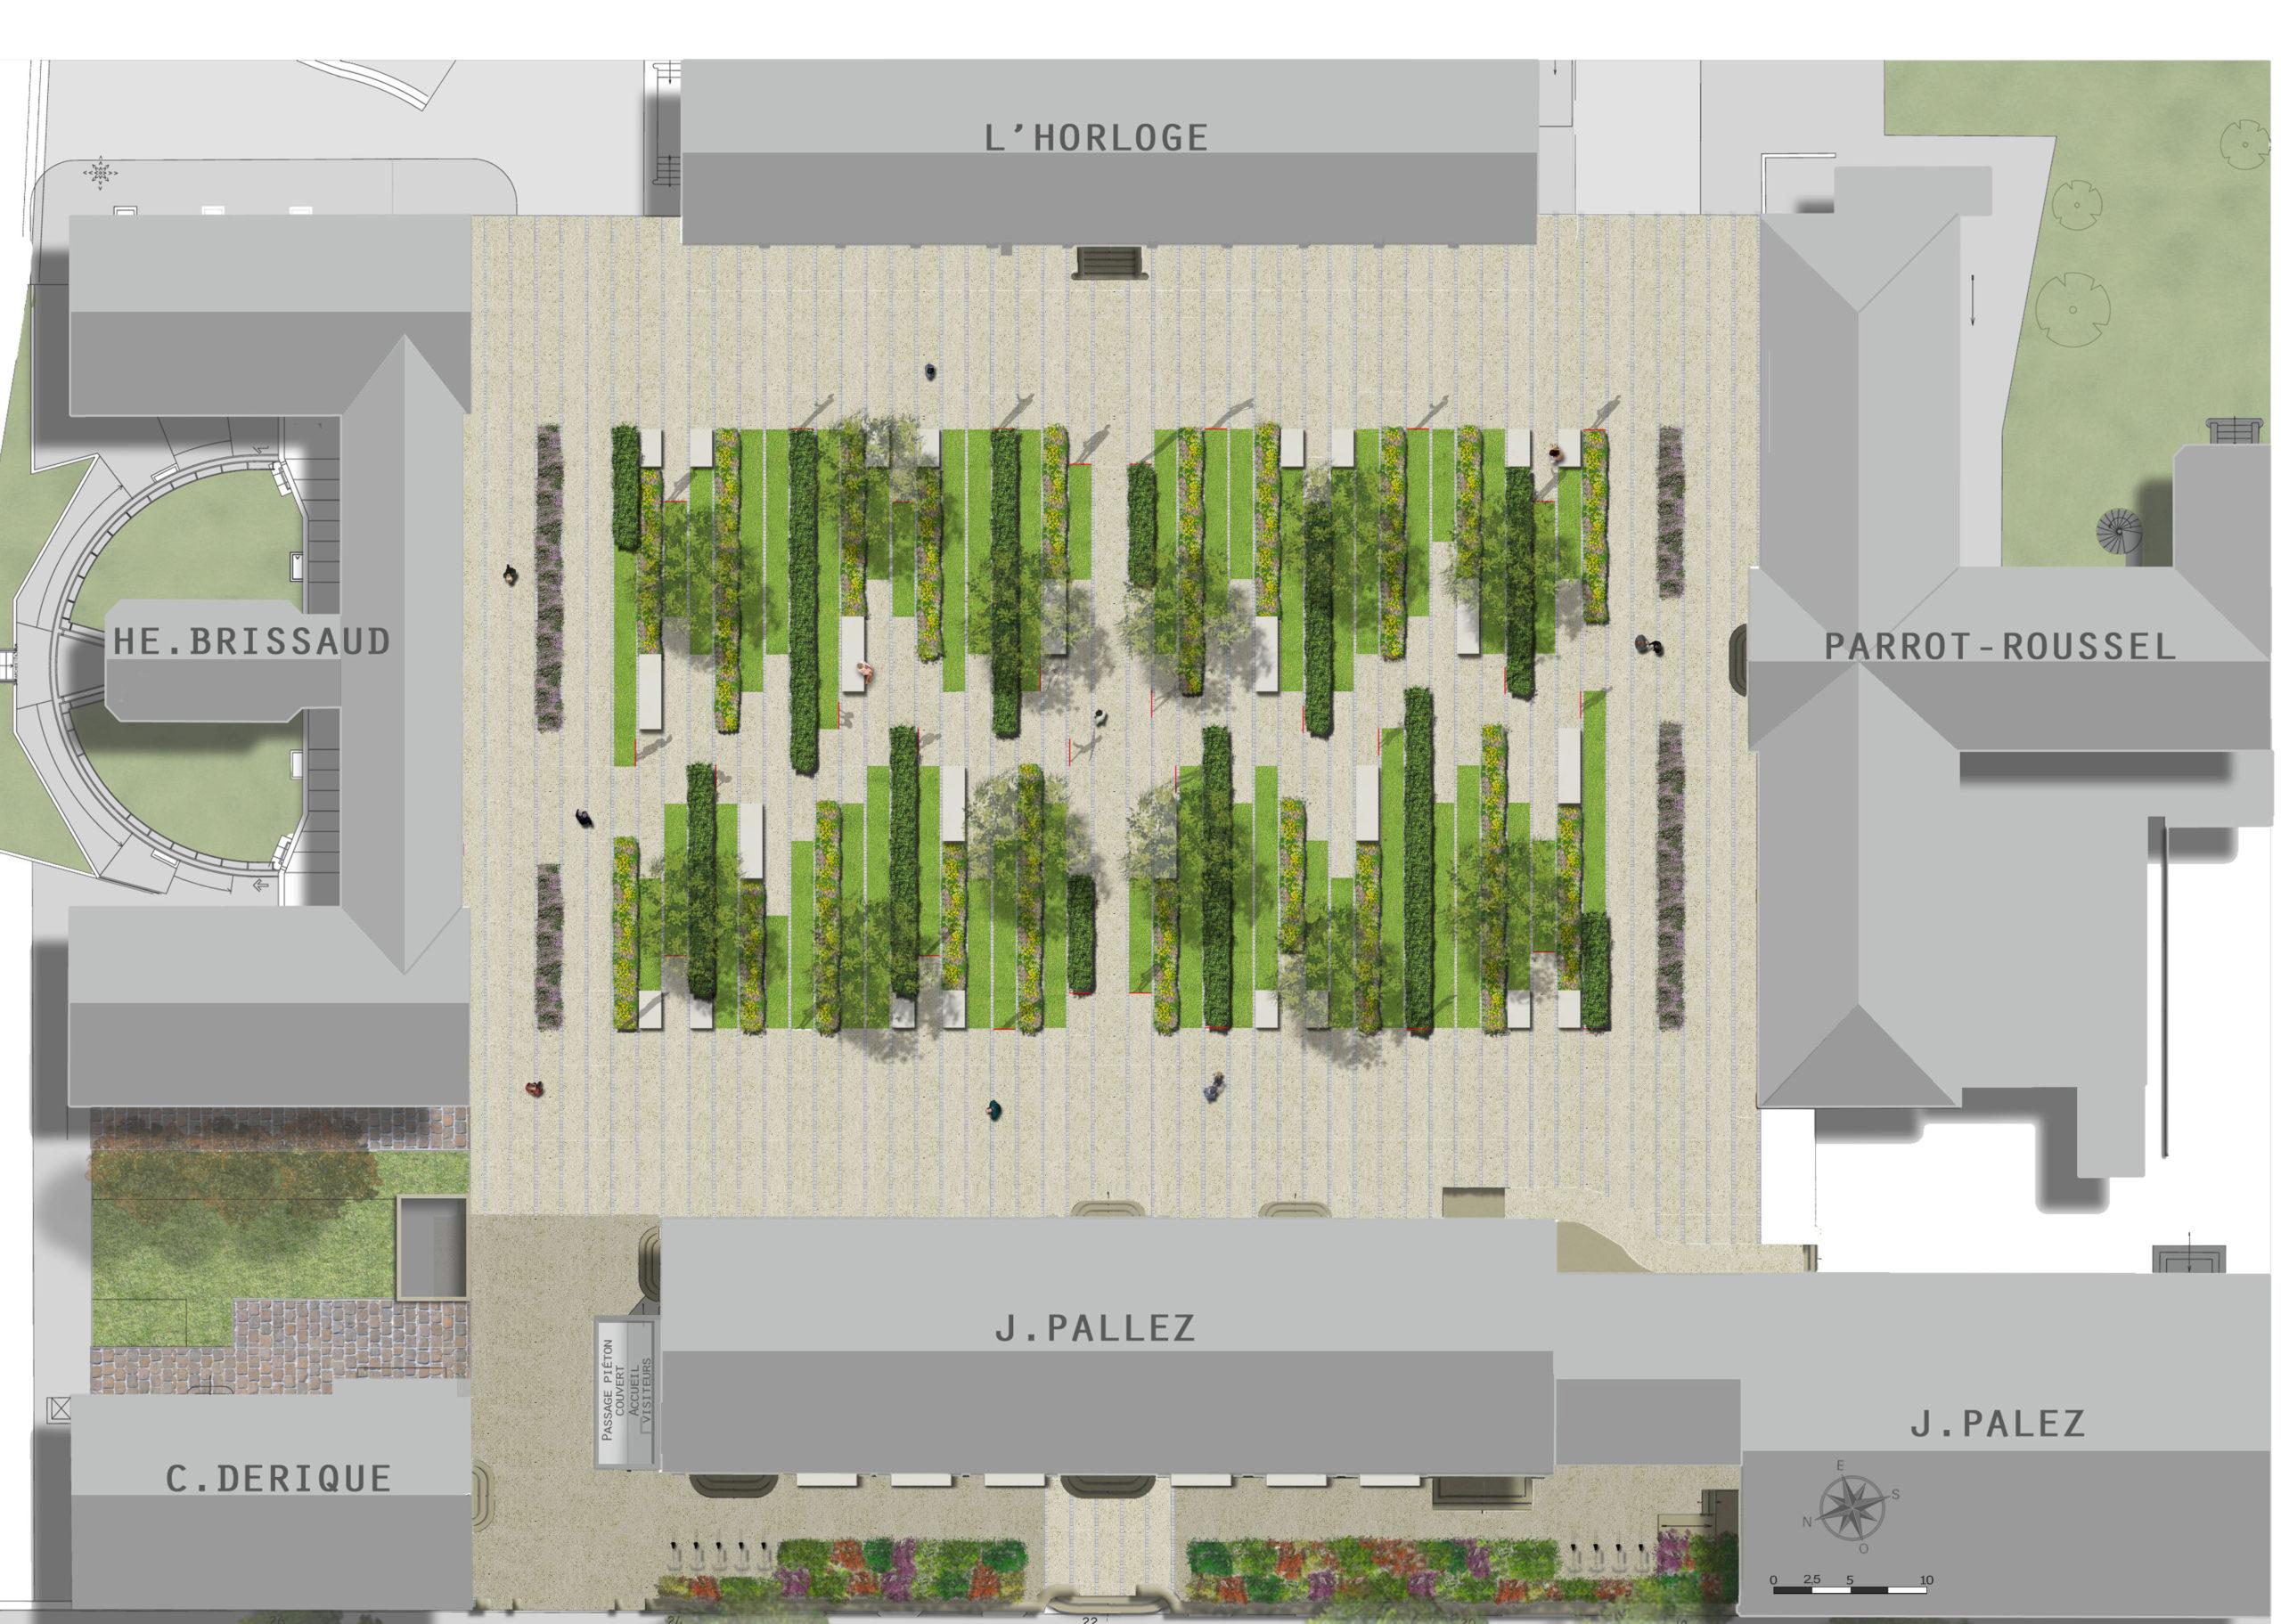 plan masse-Jardin des portraits-idspace